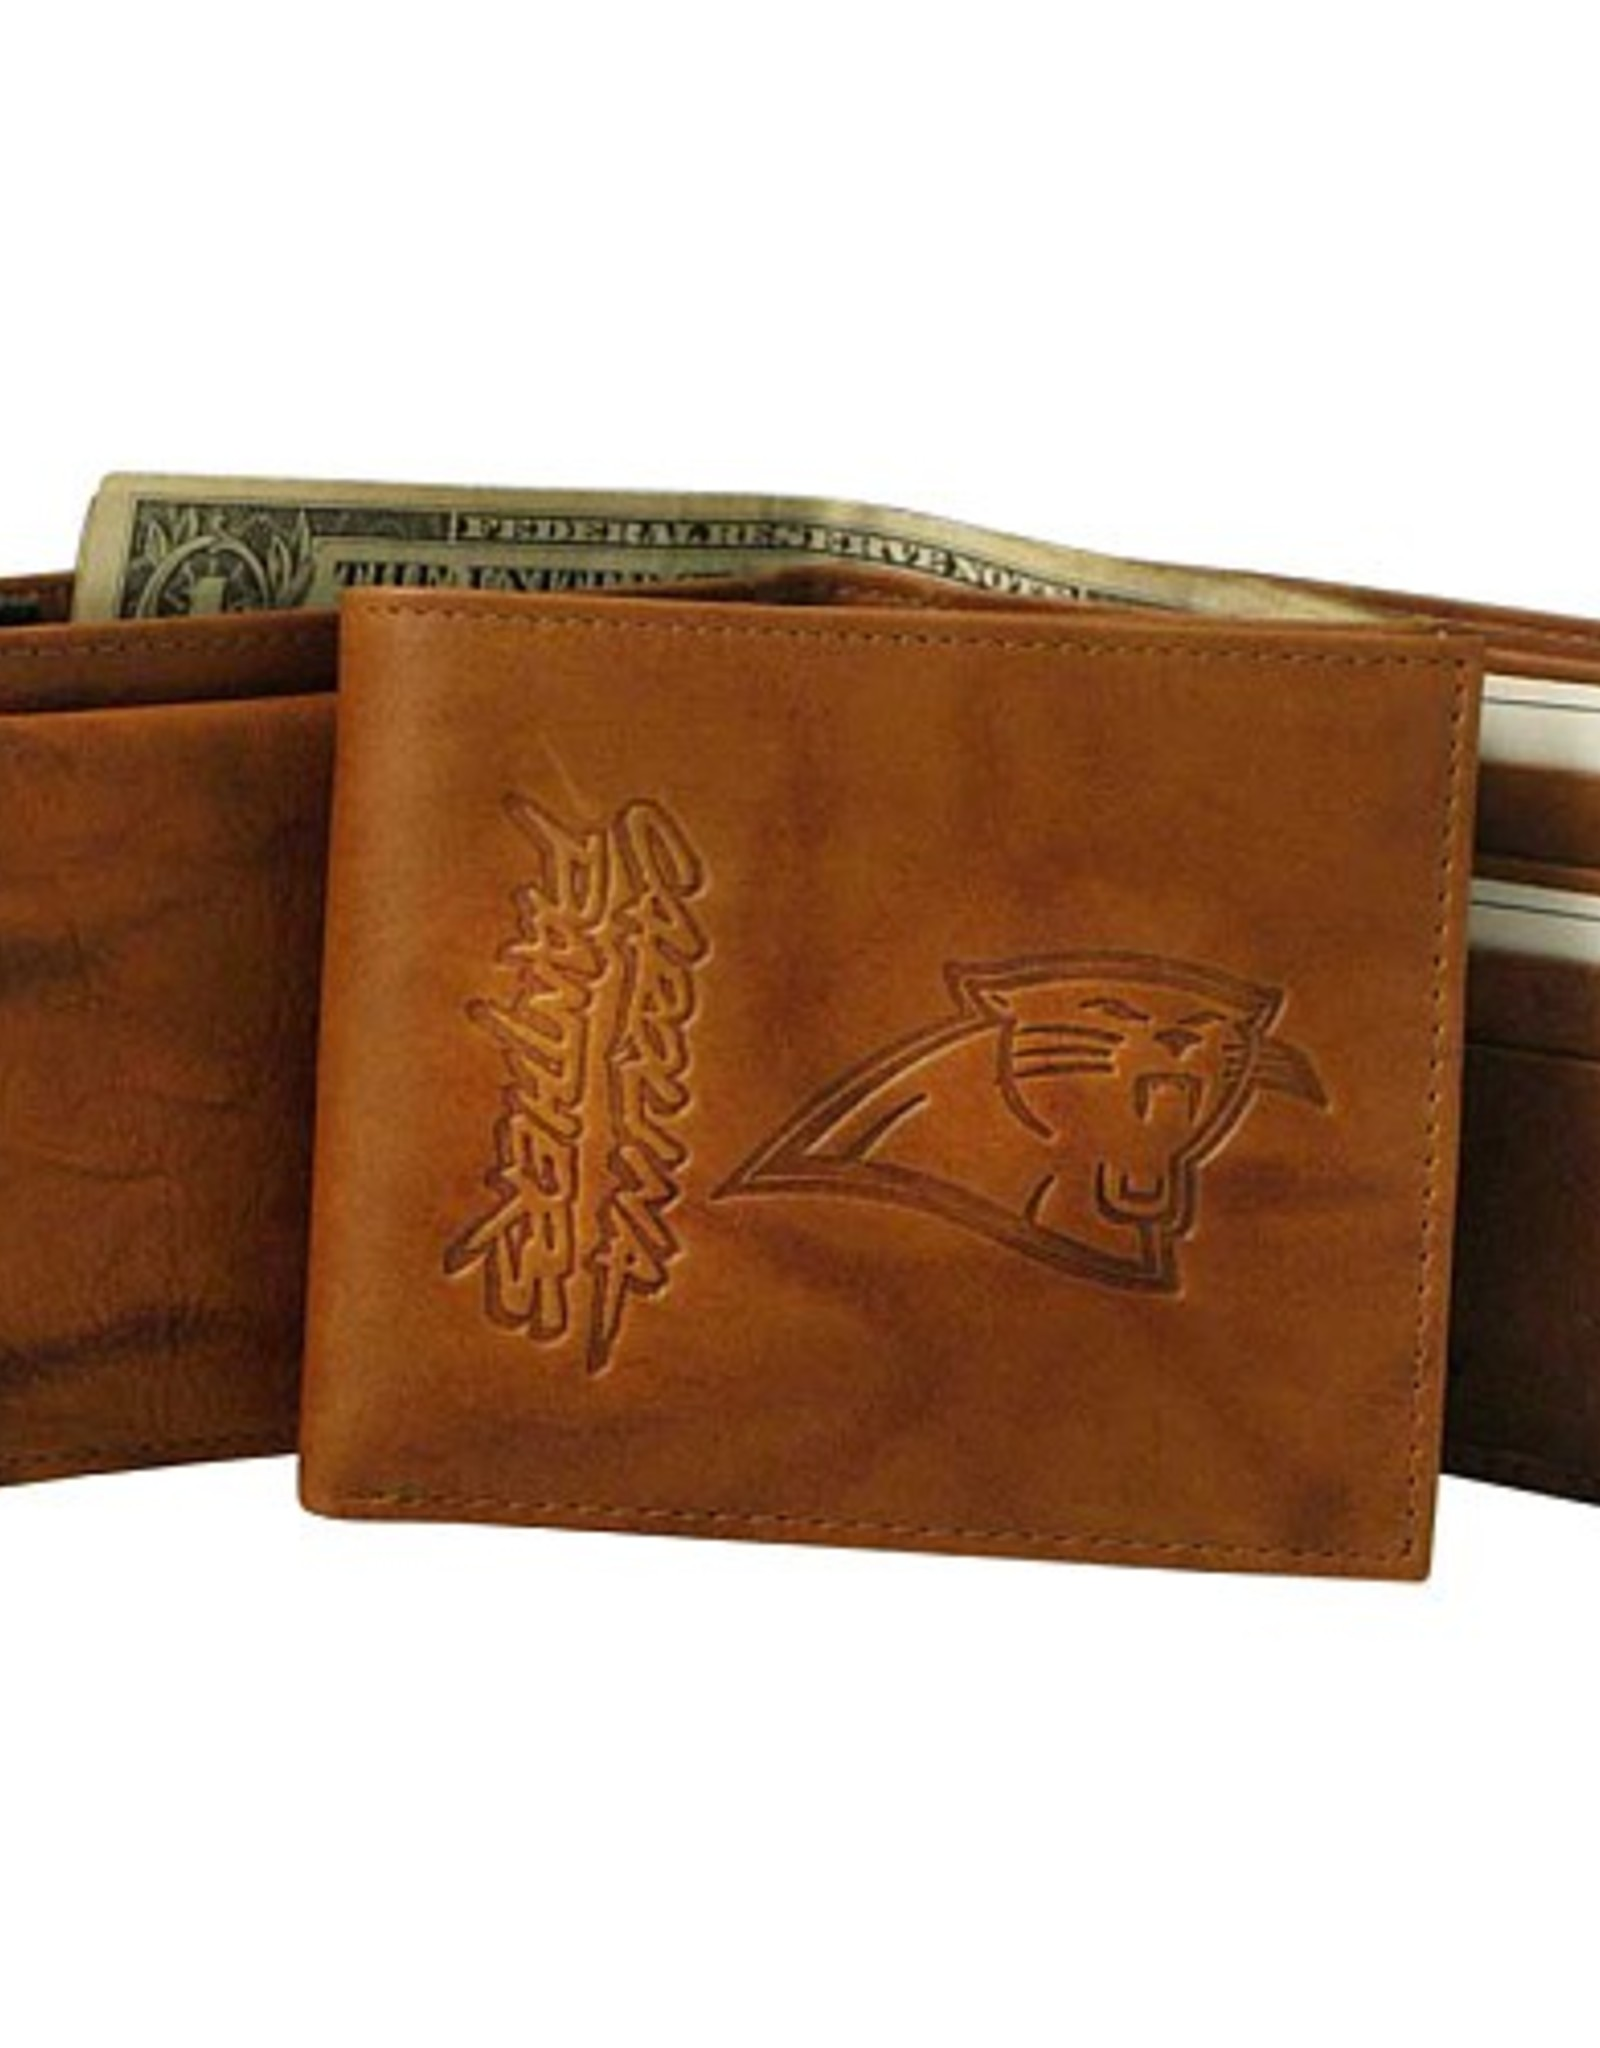 RICO INDUSTRIES Carolina Panthers Genuine Leather Vintage Billfold Wallet